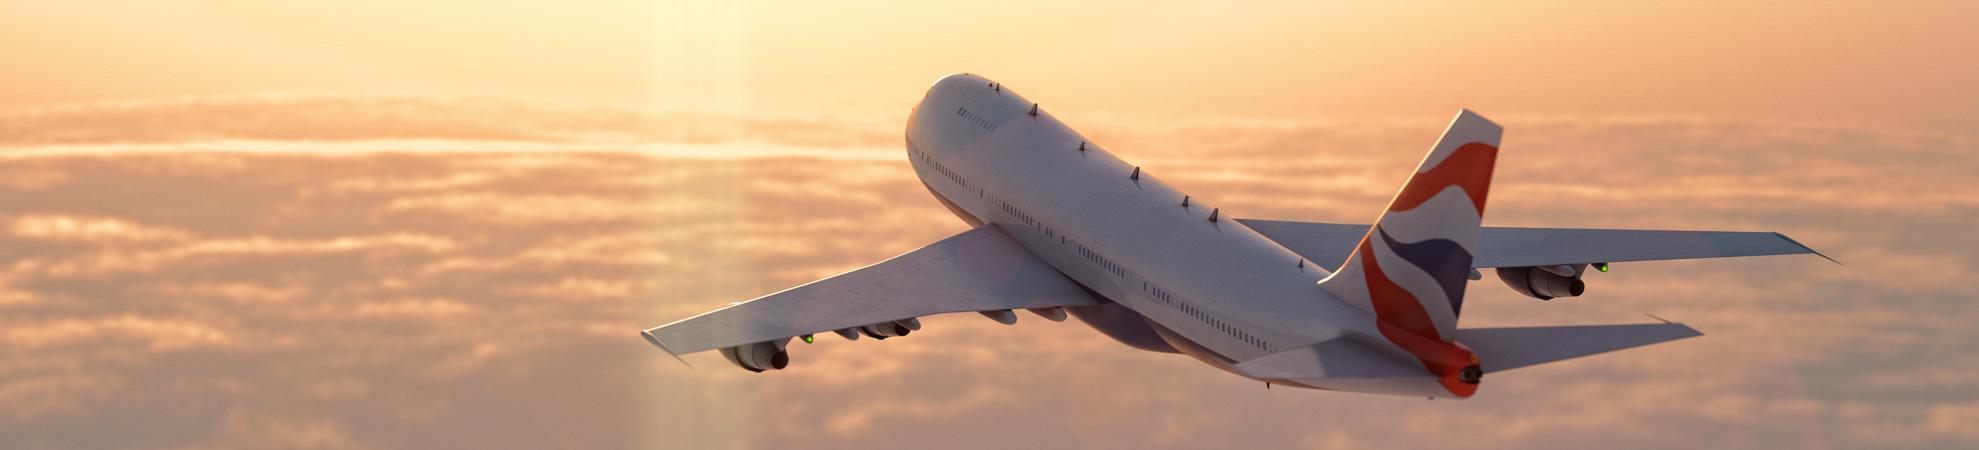 Aller en Nouvelle-Zélande en avion